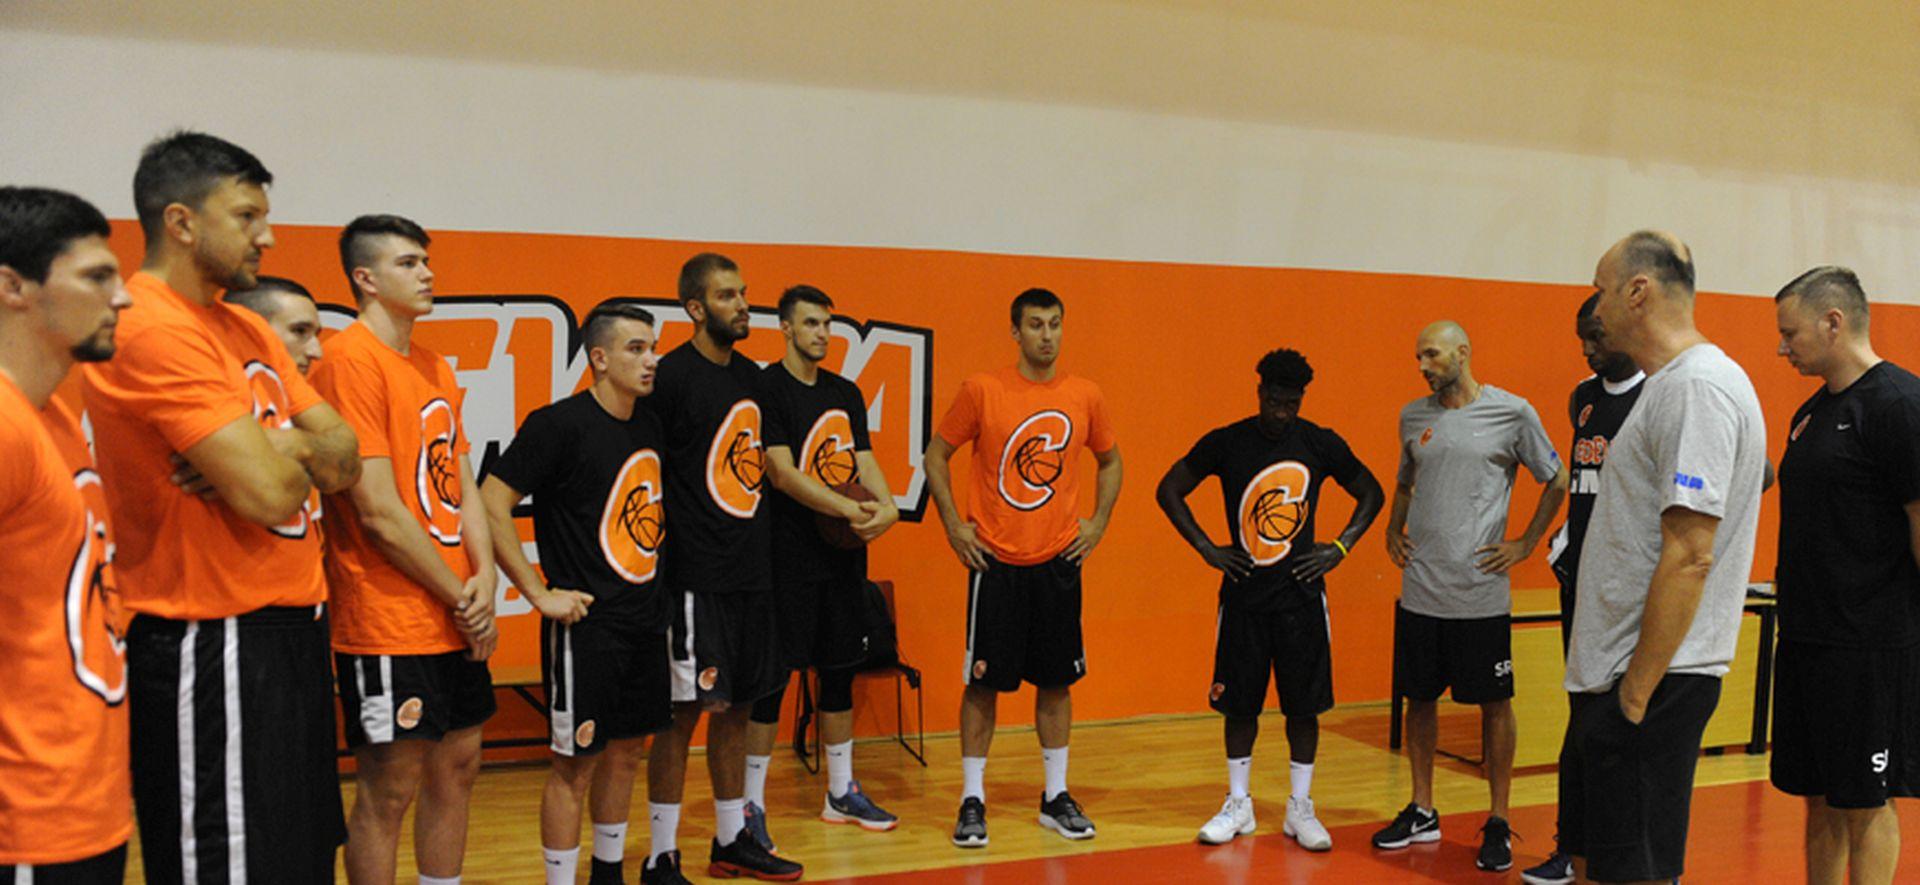 ZDOVC SAZVAO CEDEVITU Testiranjima hrvatski košarkaški prvak započeo pripreme